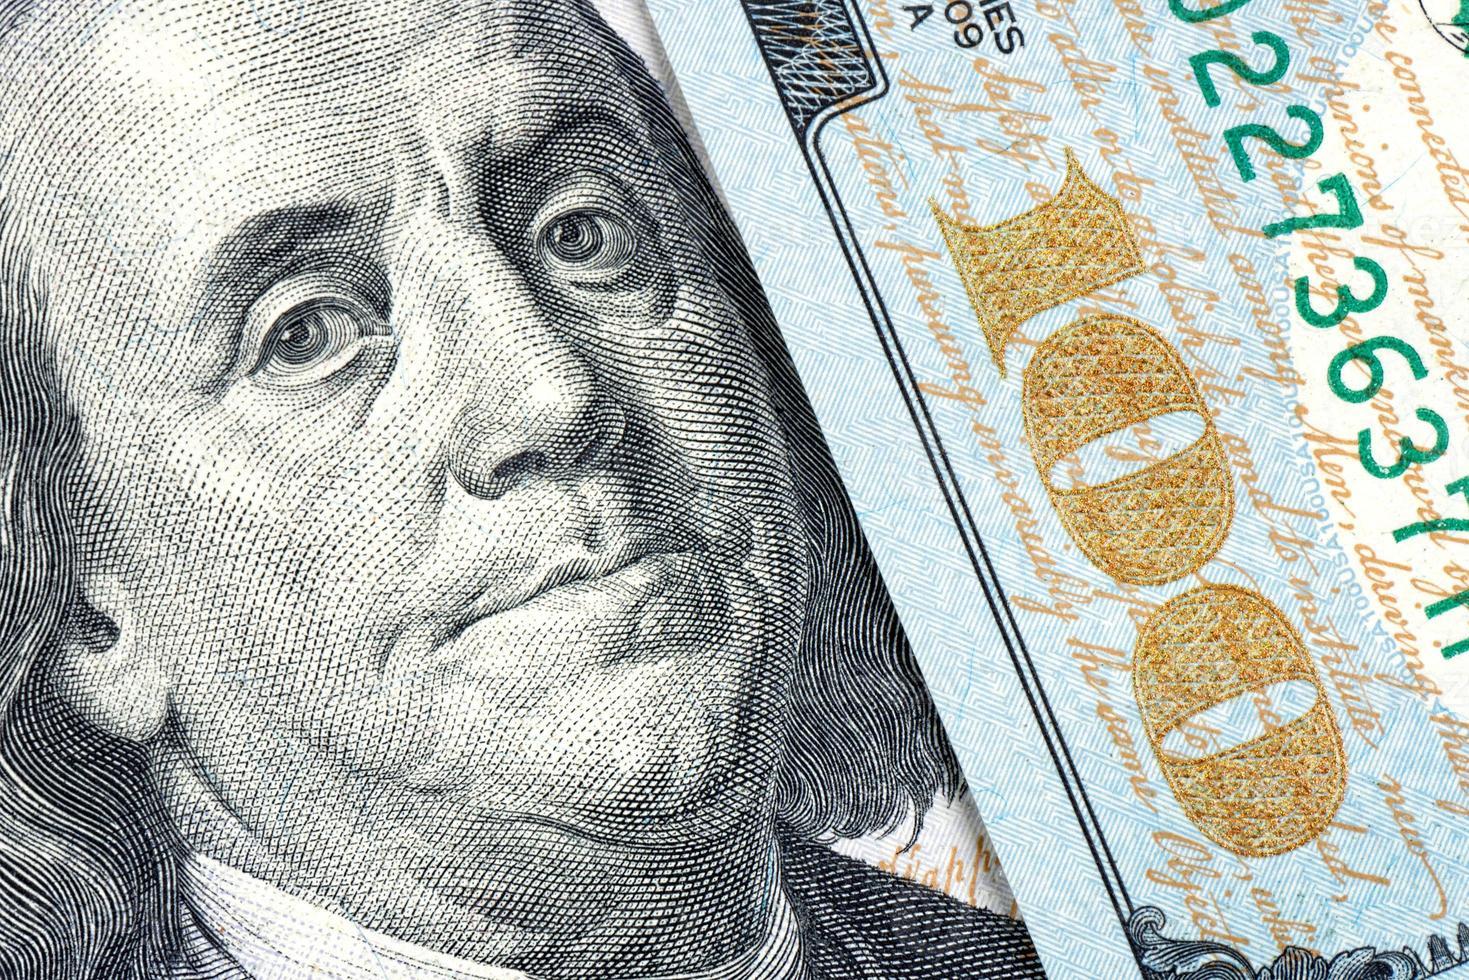 Benjamin Franklin, nouveau billet de 100 dollars photo